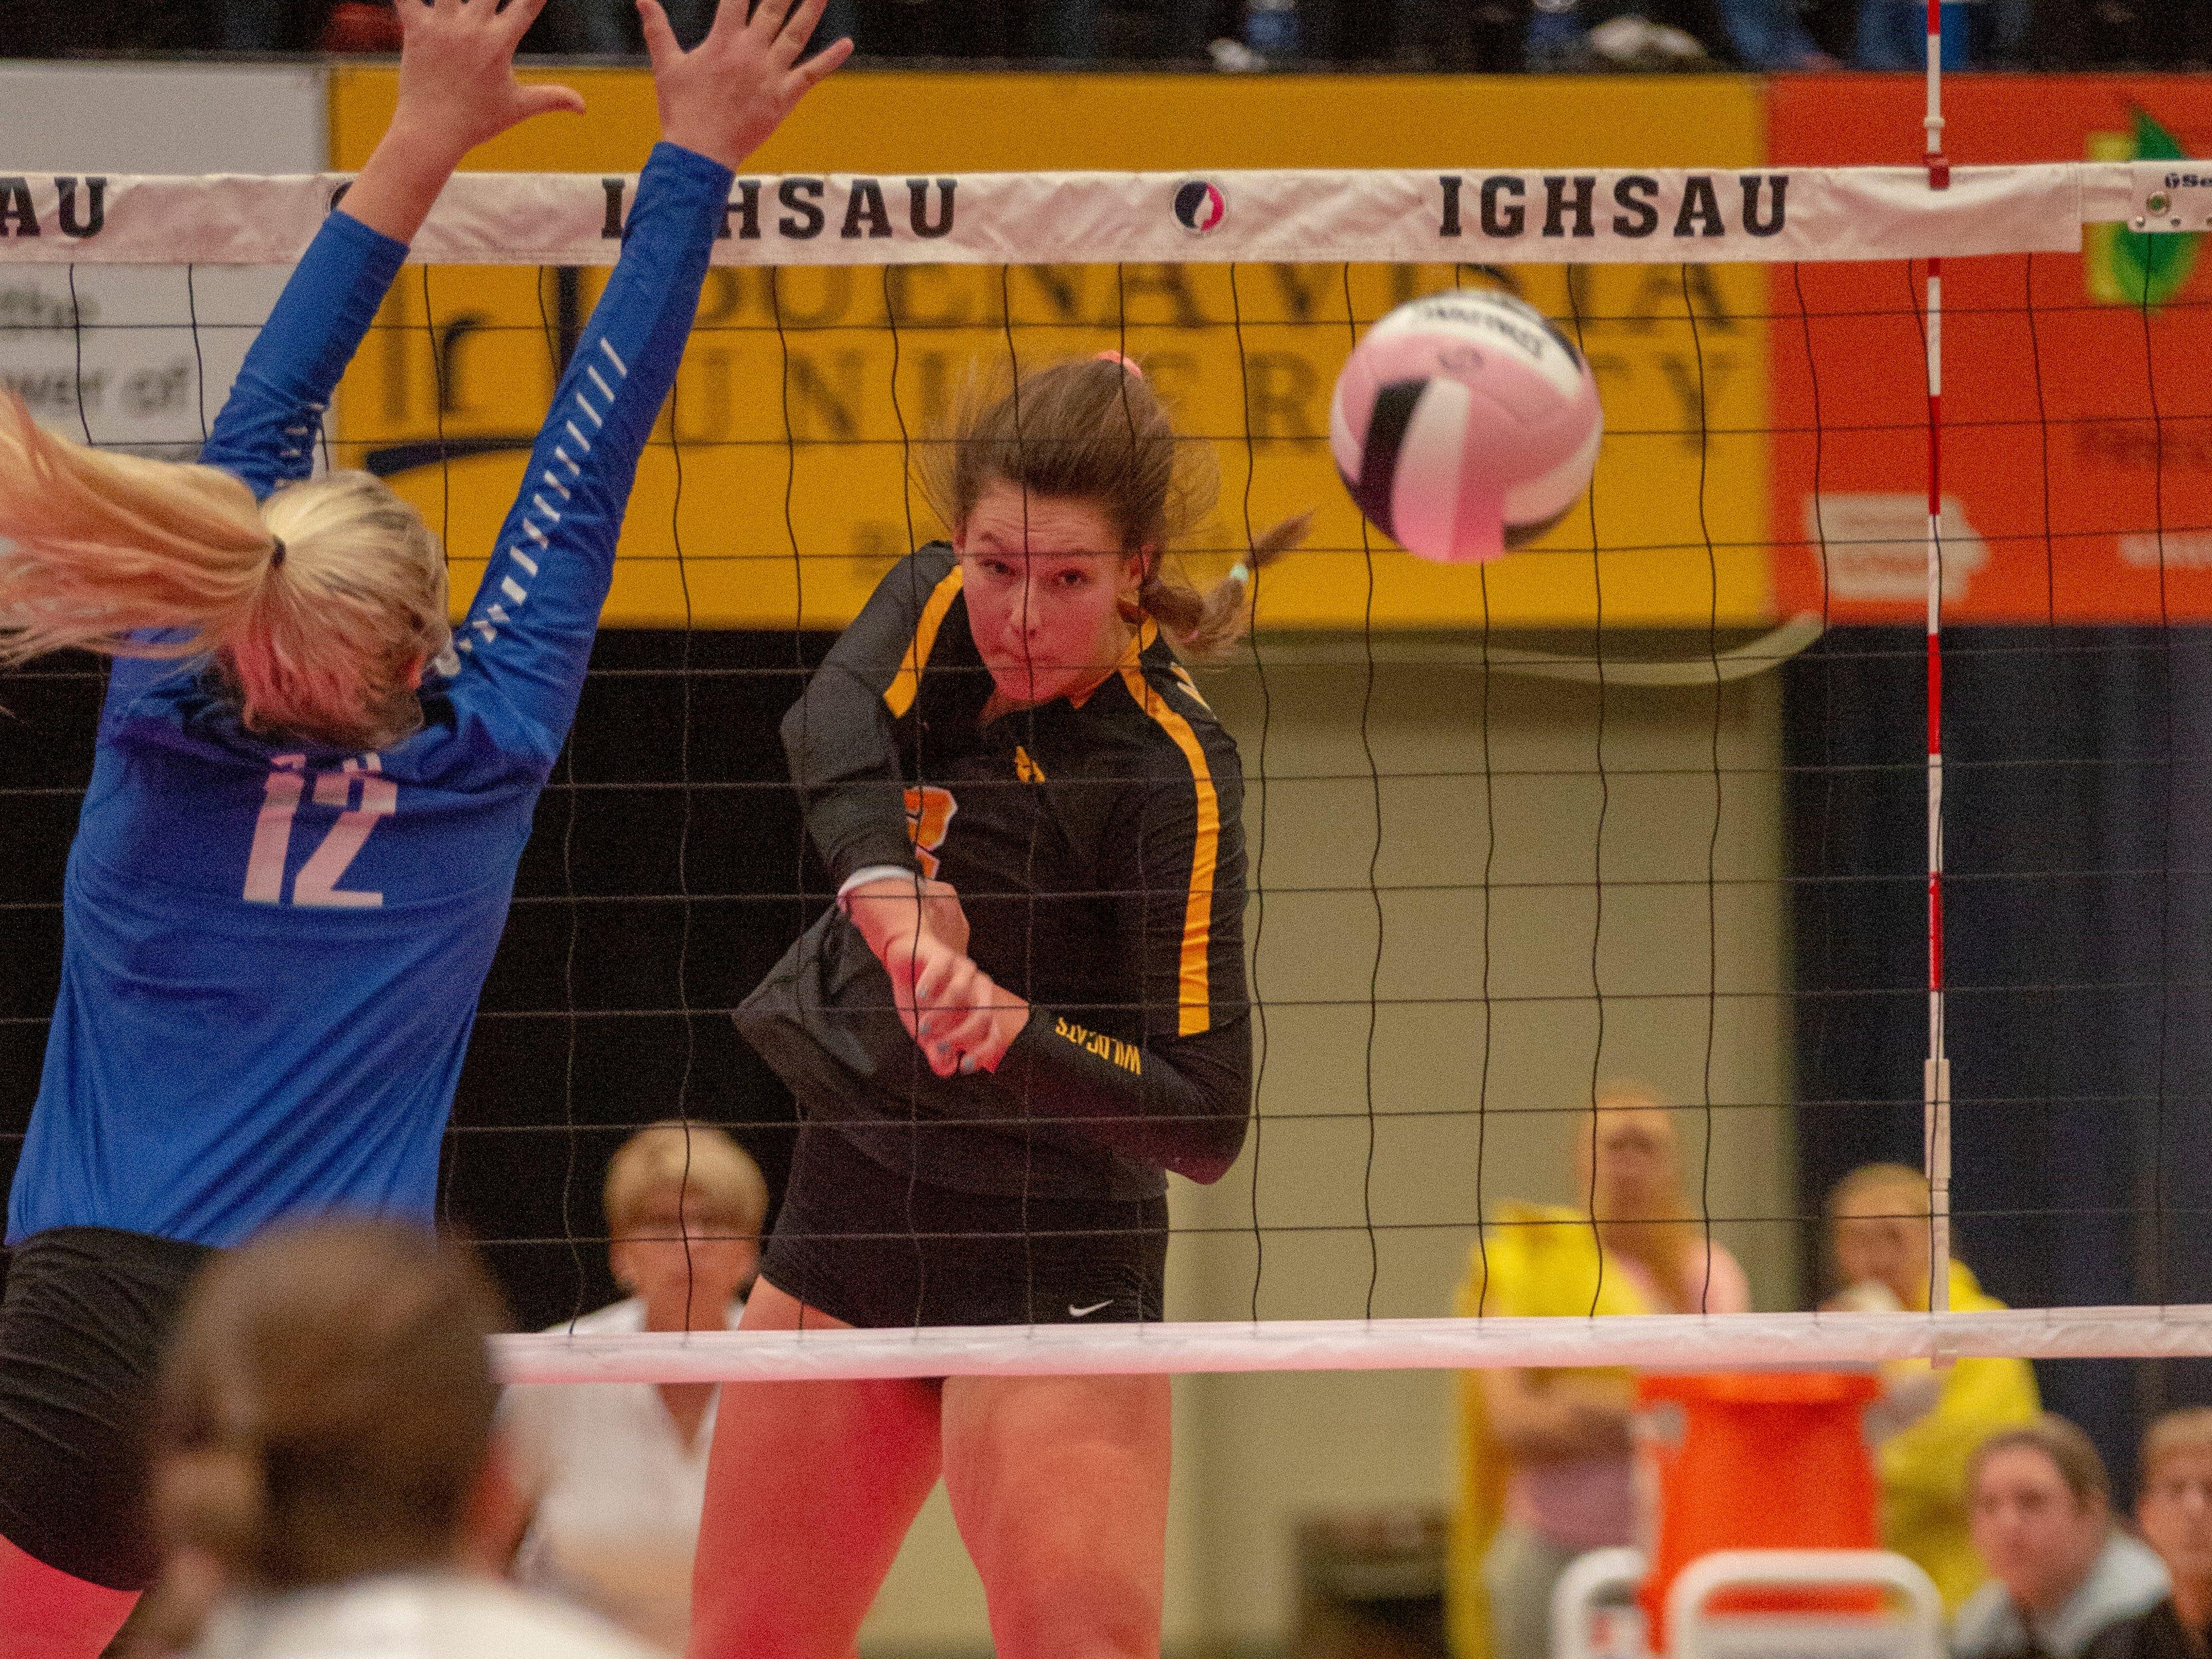 Janesville's Bree Thompson sends an attack during a quarterfinal match Wednesday.